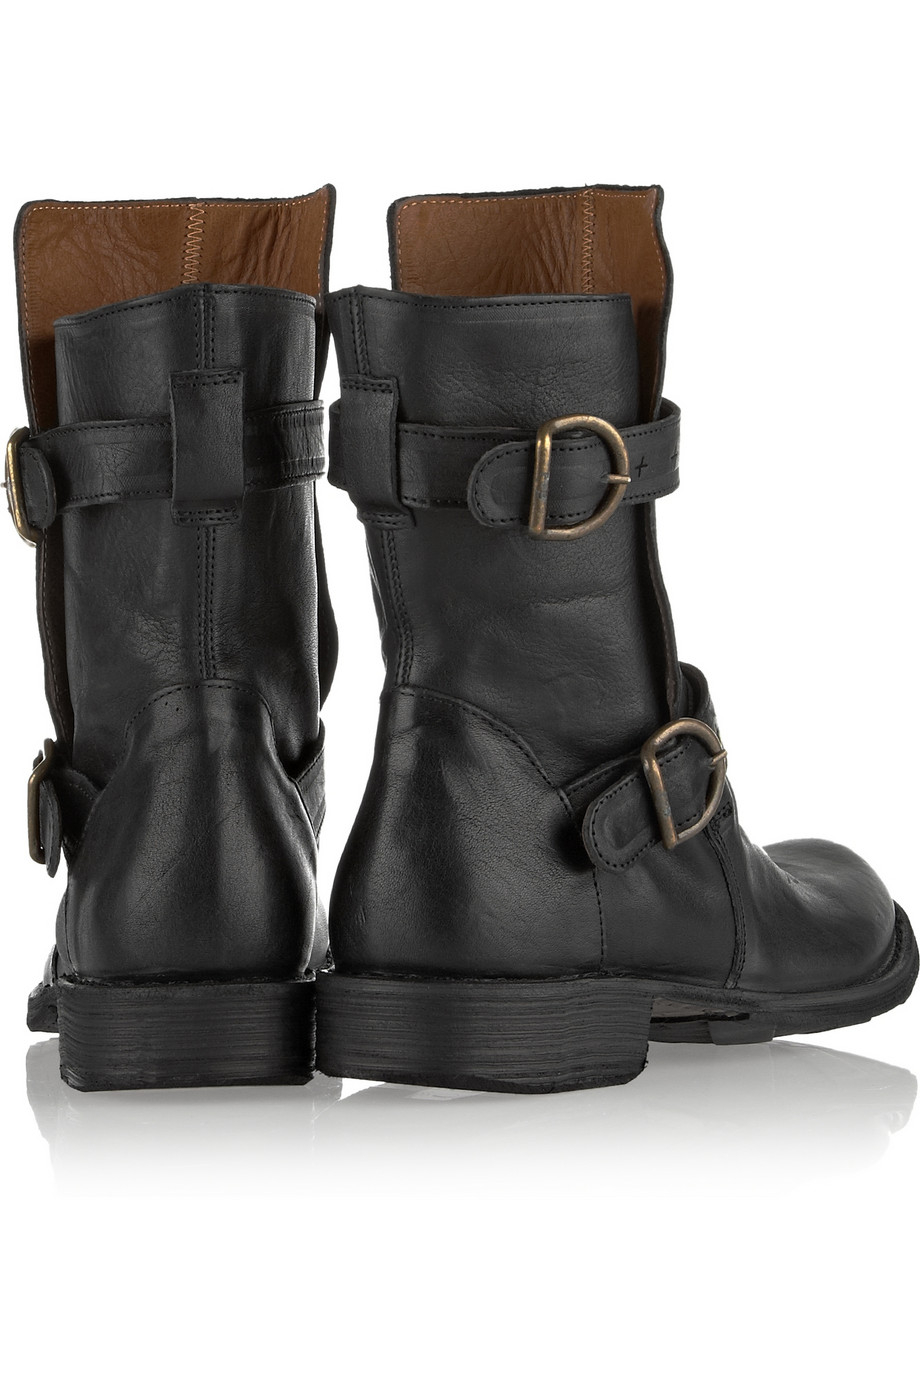 fiorentini baker eternity leather biker boots in black lyst. Black Bedroom Furniture Sets. Home Design Ideas